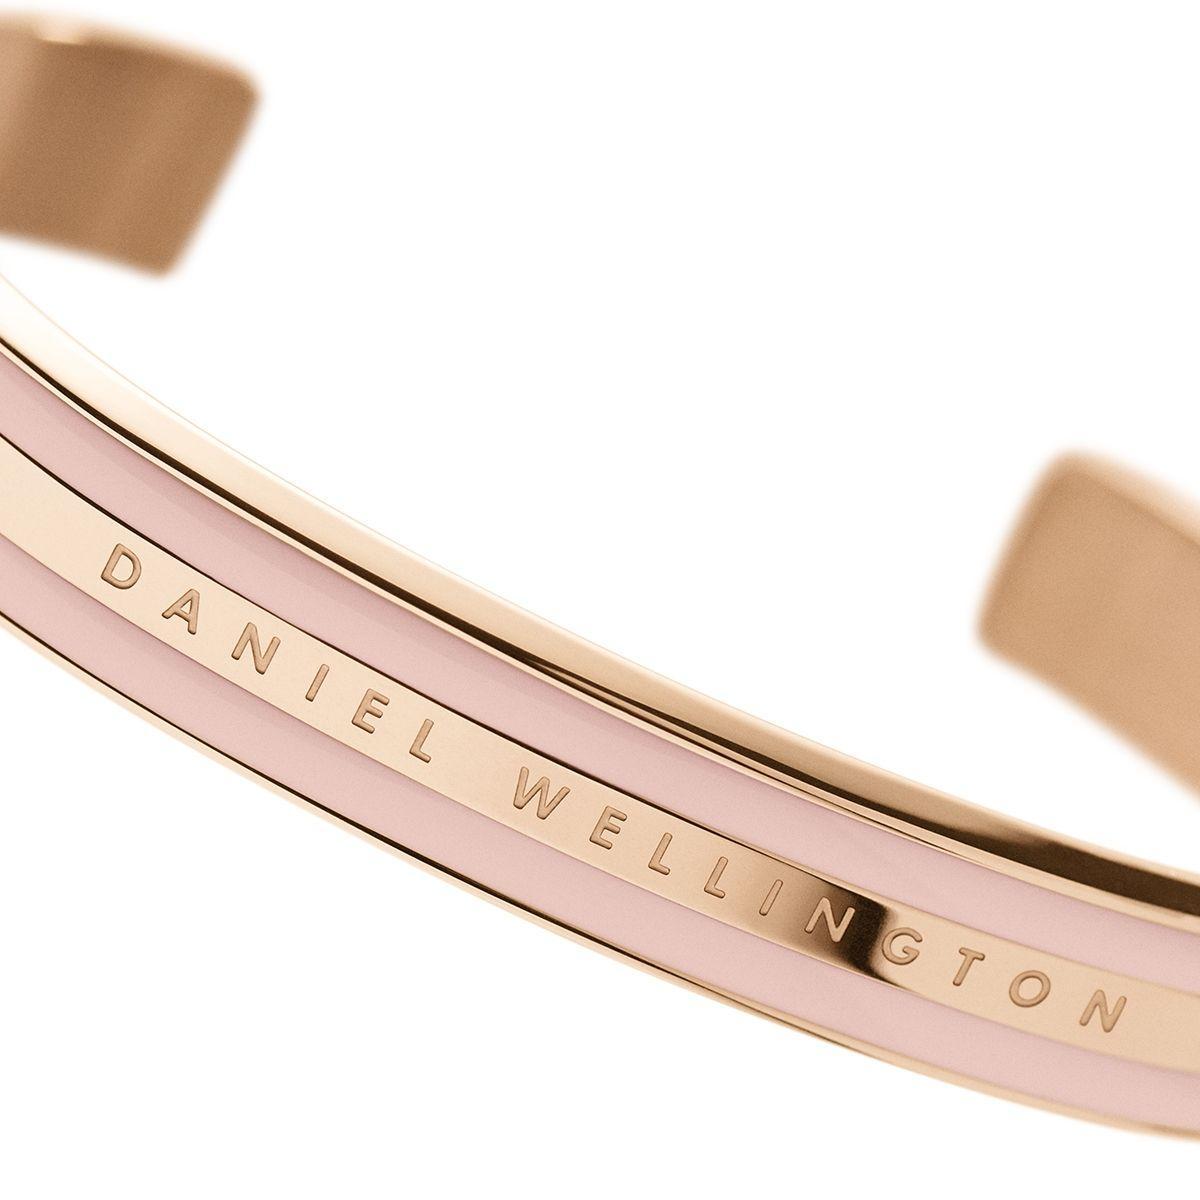 dw官网 dw手表官网 dw中国官网 dw官方旗舰店 DW DW官网  Classic Bracelet Dusty Rose RG S